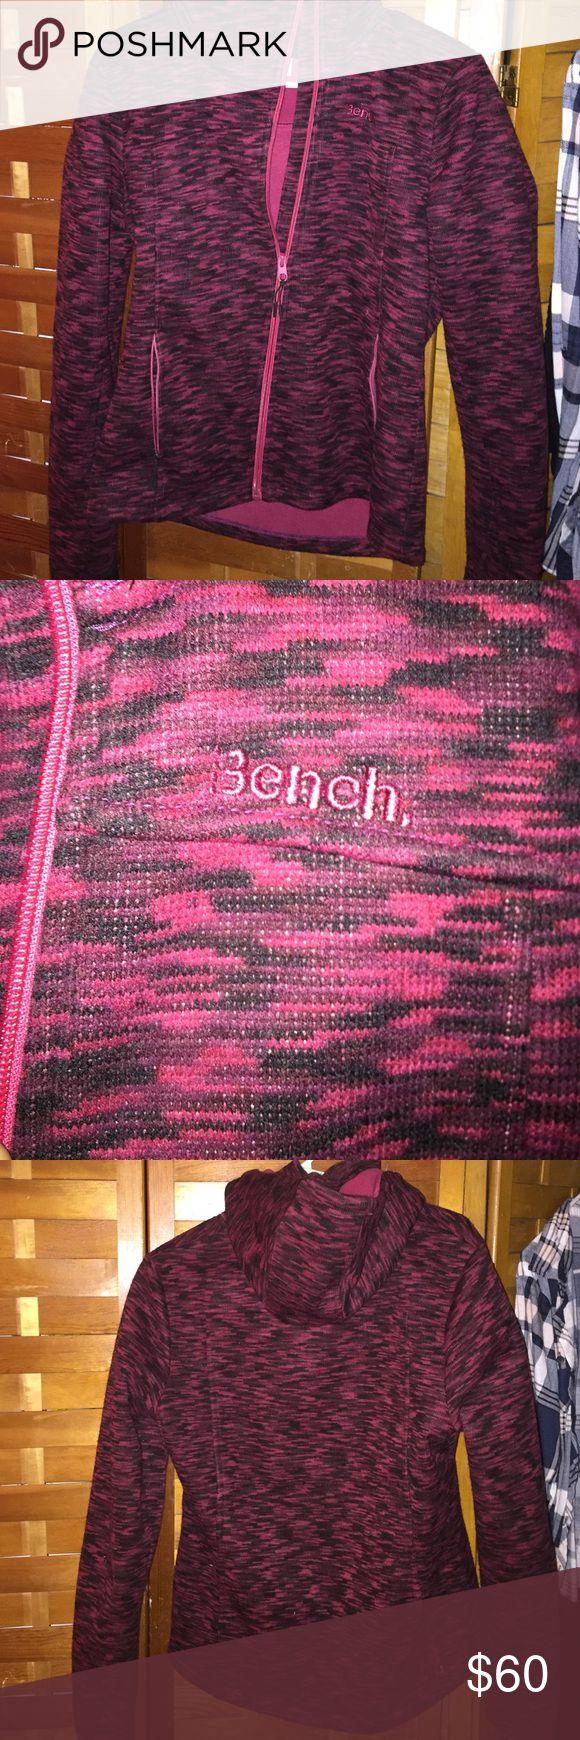 Women's medium Bench Jacket Light weight Bench jacket from Buckle. Bench Jackets & Coats Utility Jackets